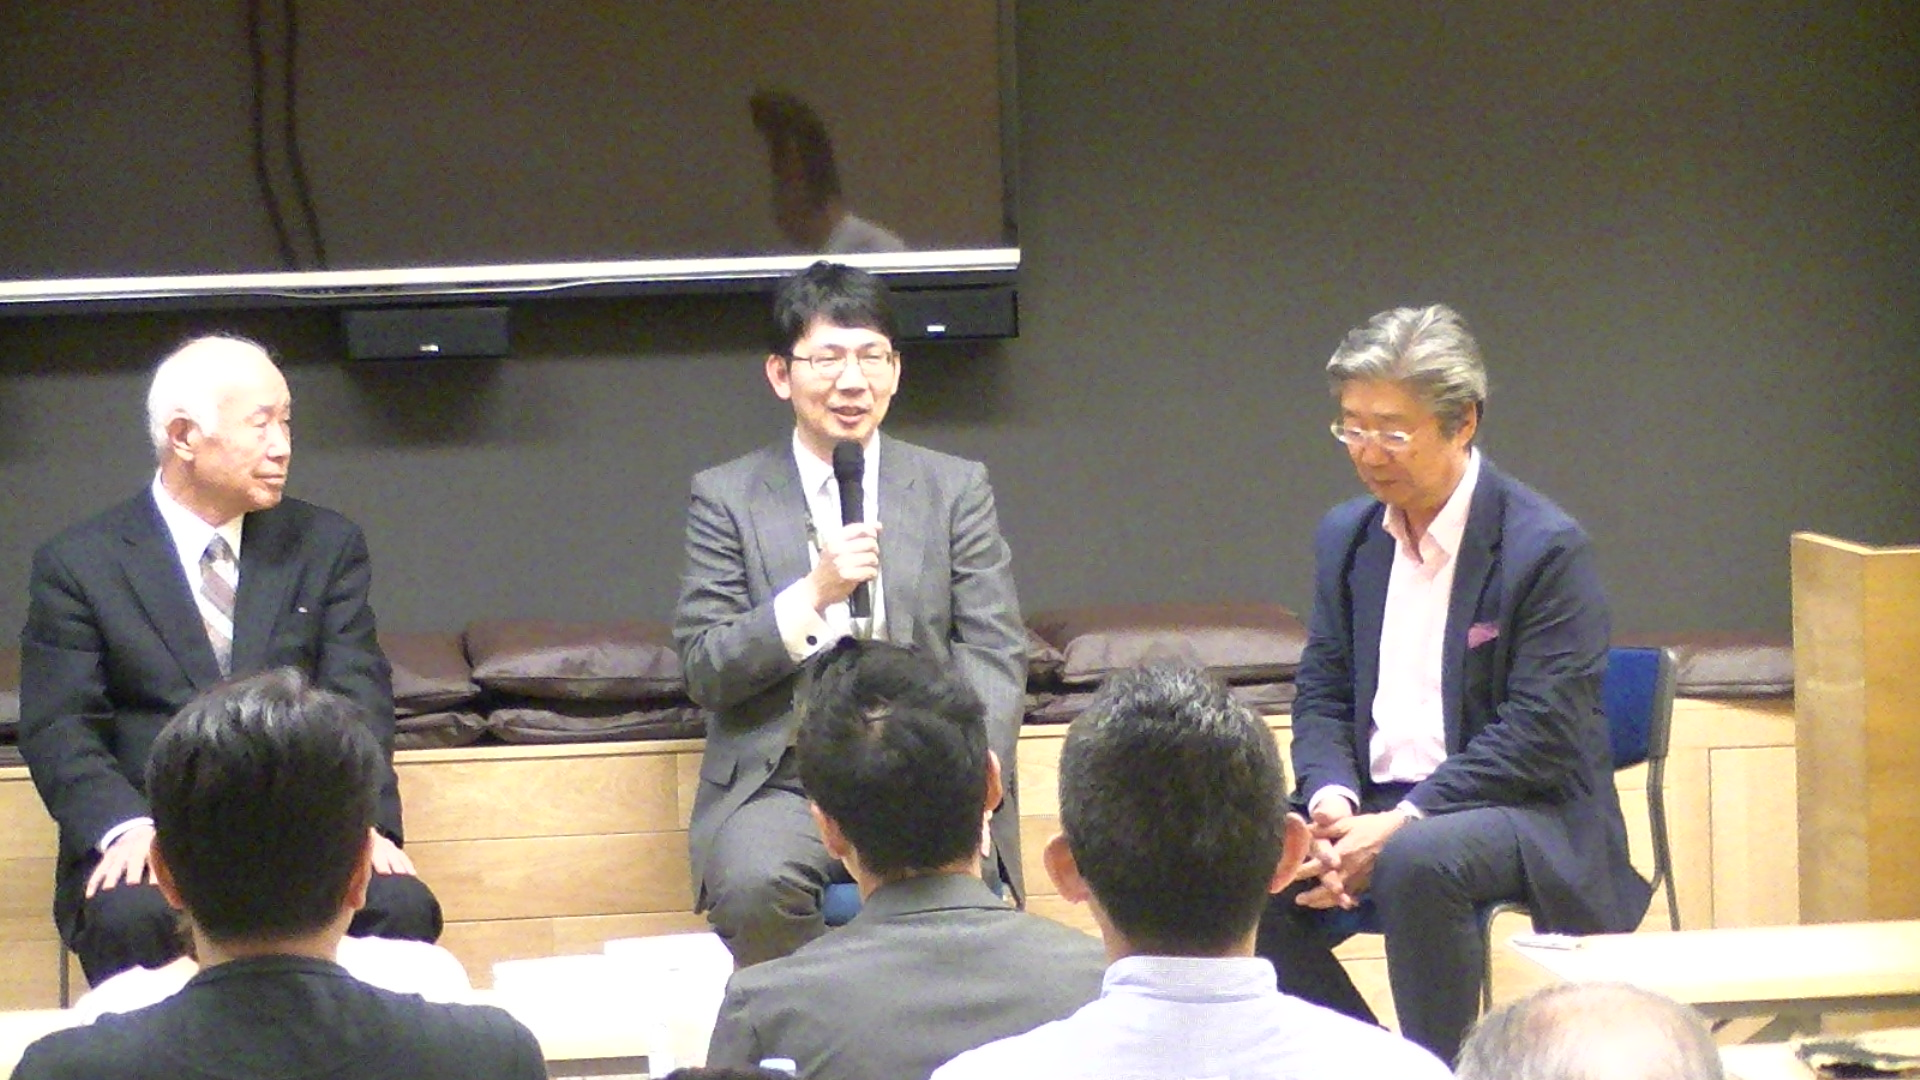 PIC 0039 - 4月1日東京思風塾の開催になります。